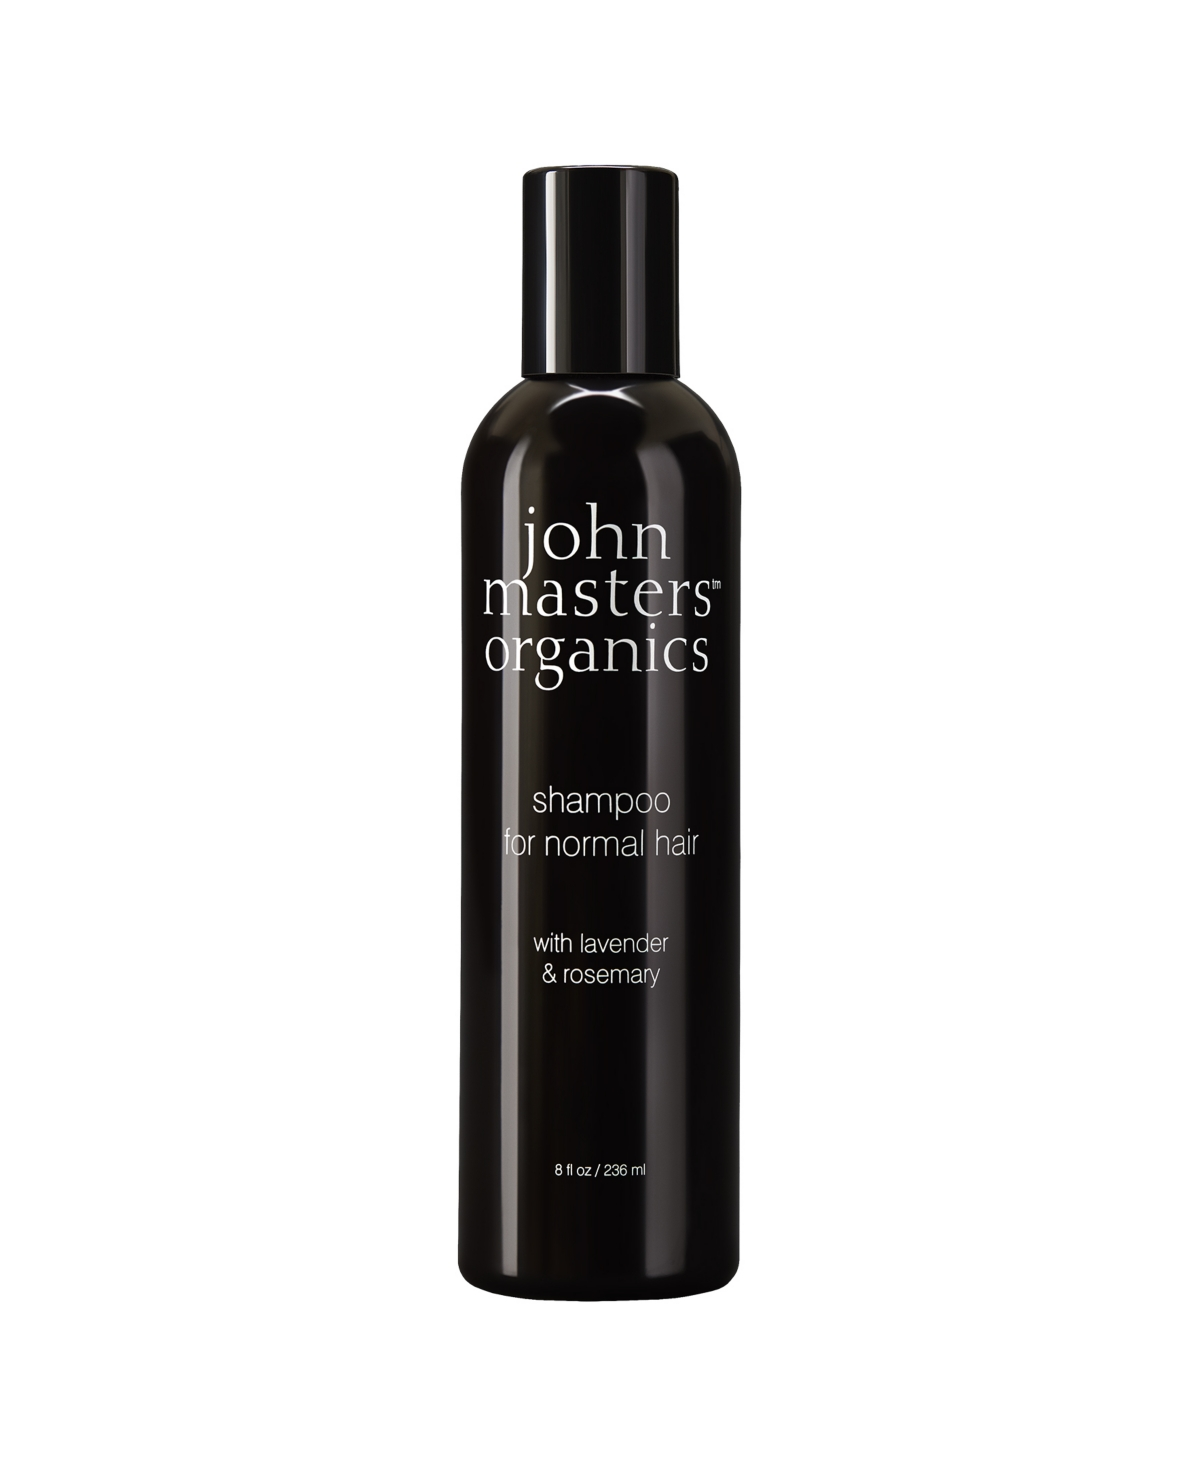 John Masters Organics Shampoo for Normal Hair with Lavender Rosemary- 8 fl. oz.